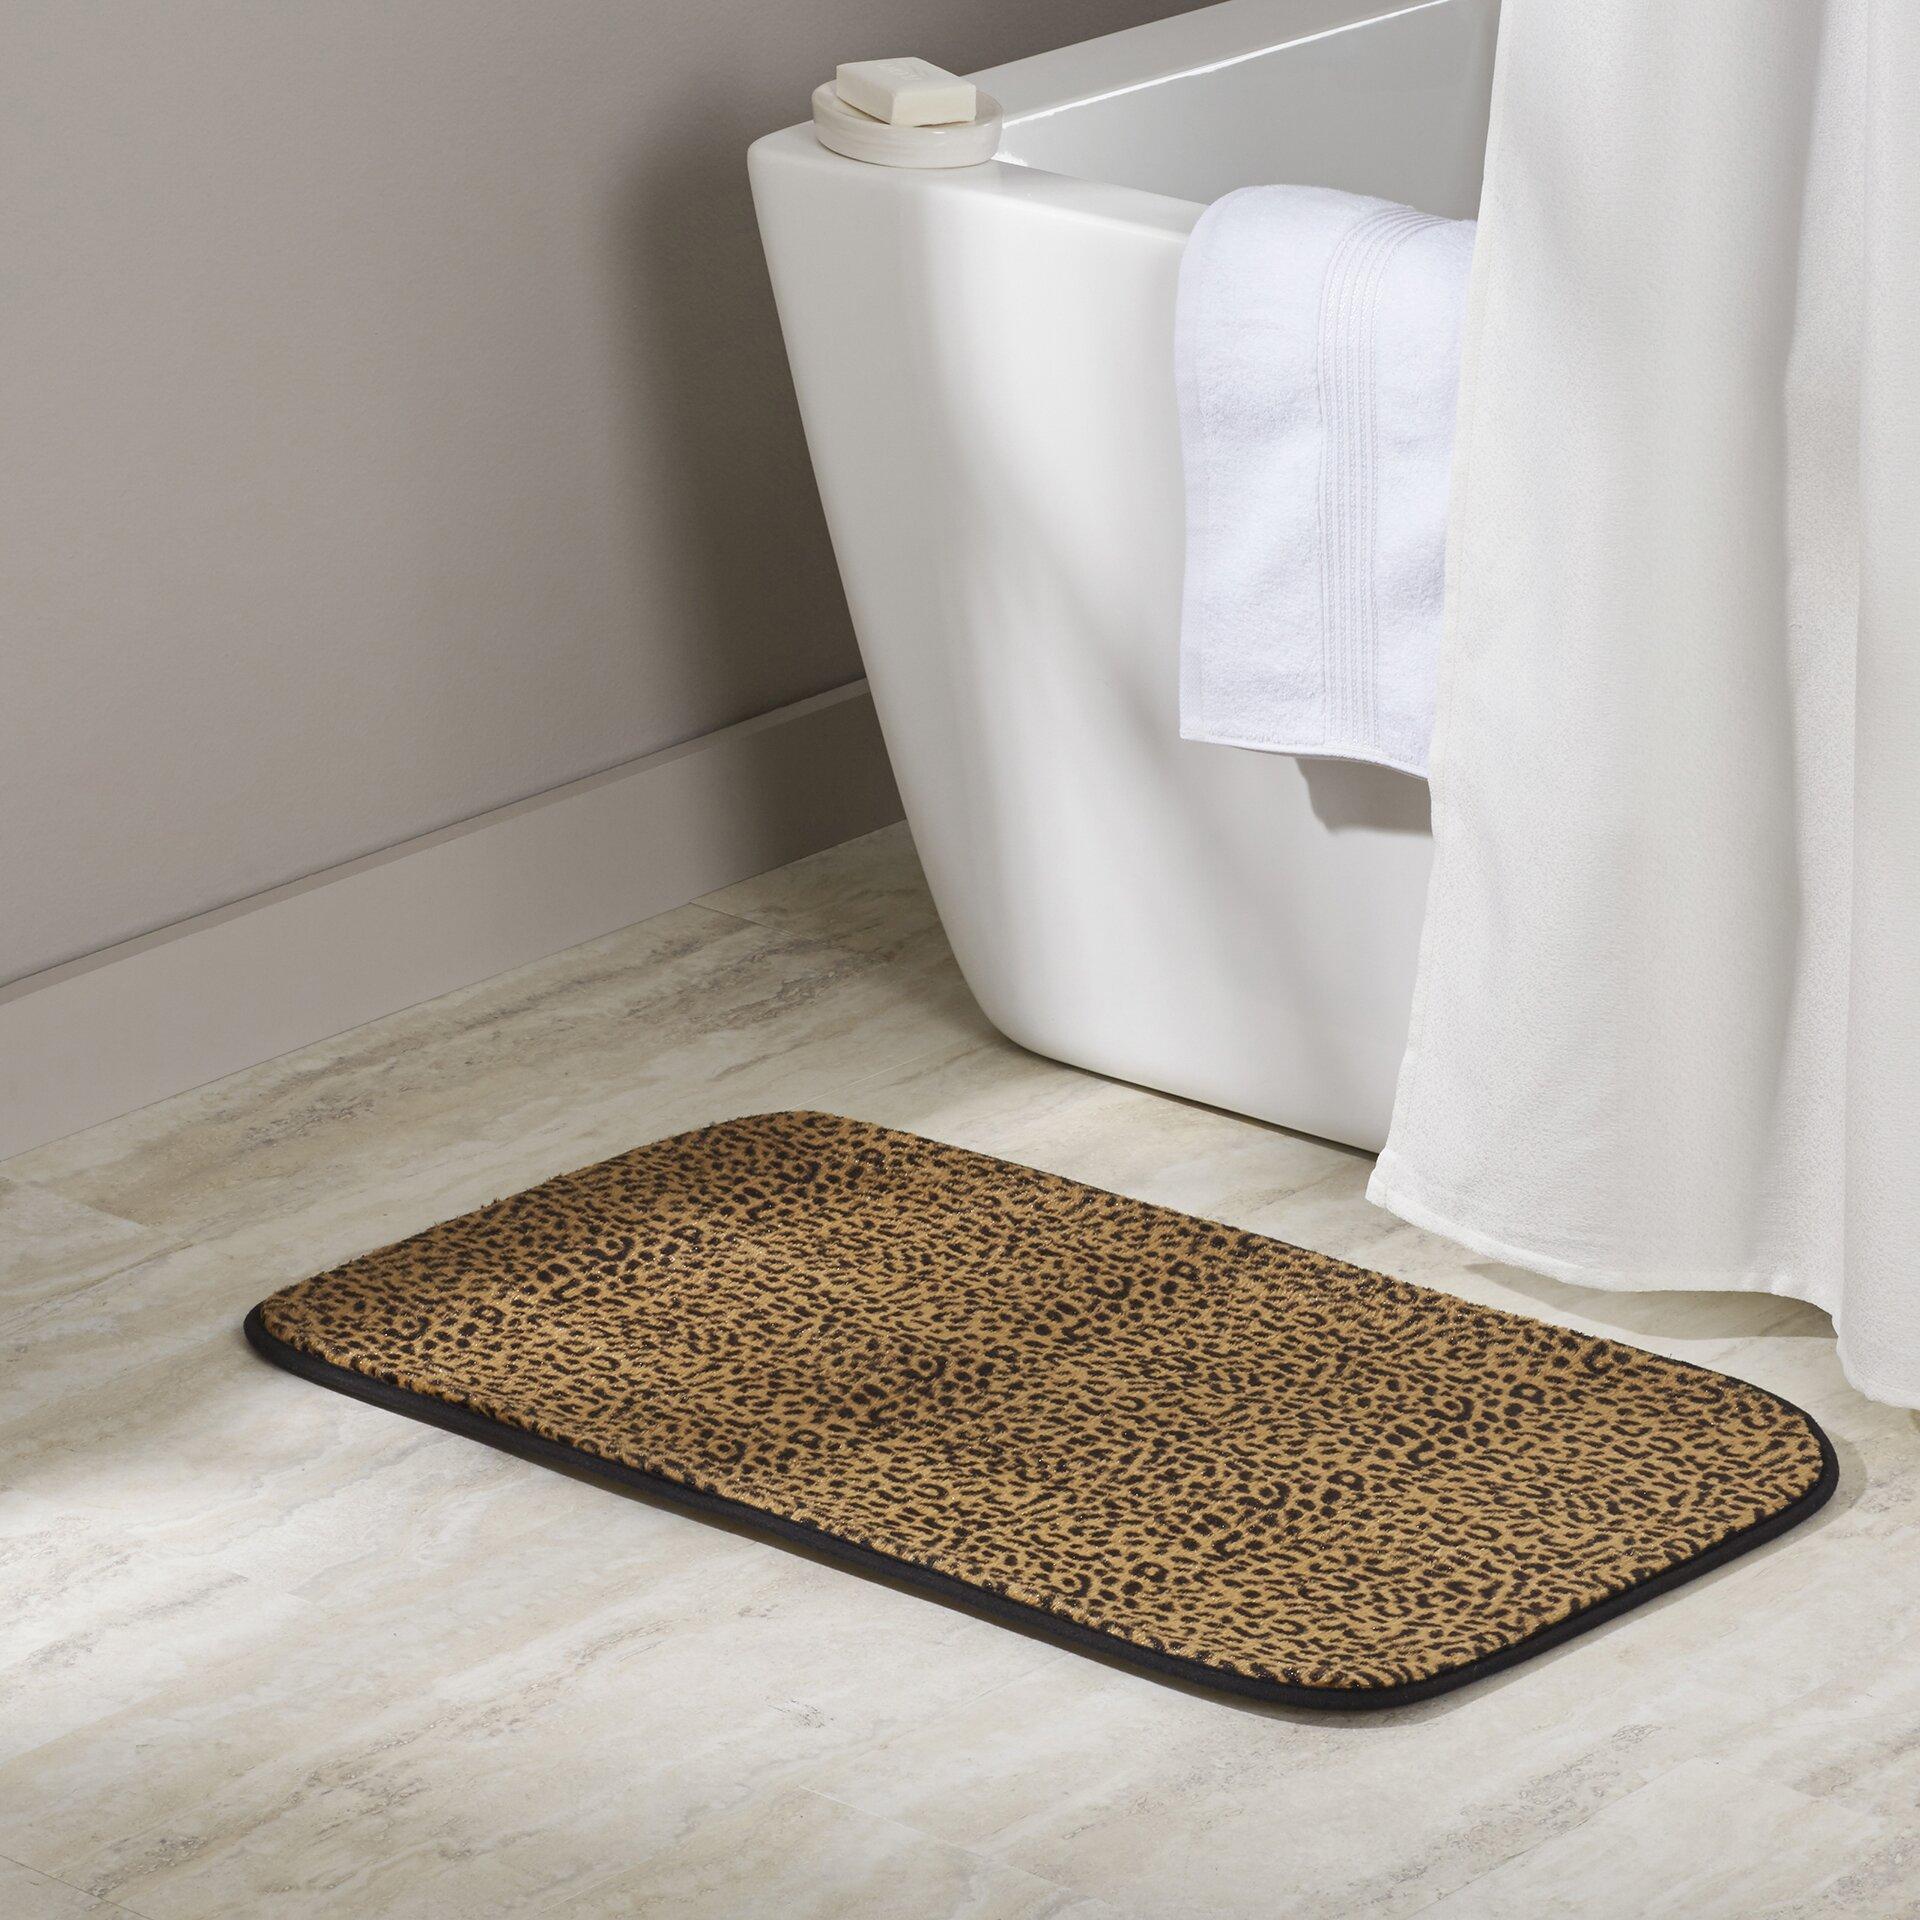 100 shower bath mat amazon com 18pcs bath rug set leopard shower bath mat bare decor dasha spa shower or door mat 315 by 1775inch solid teak